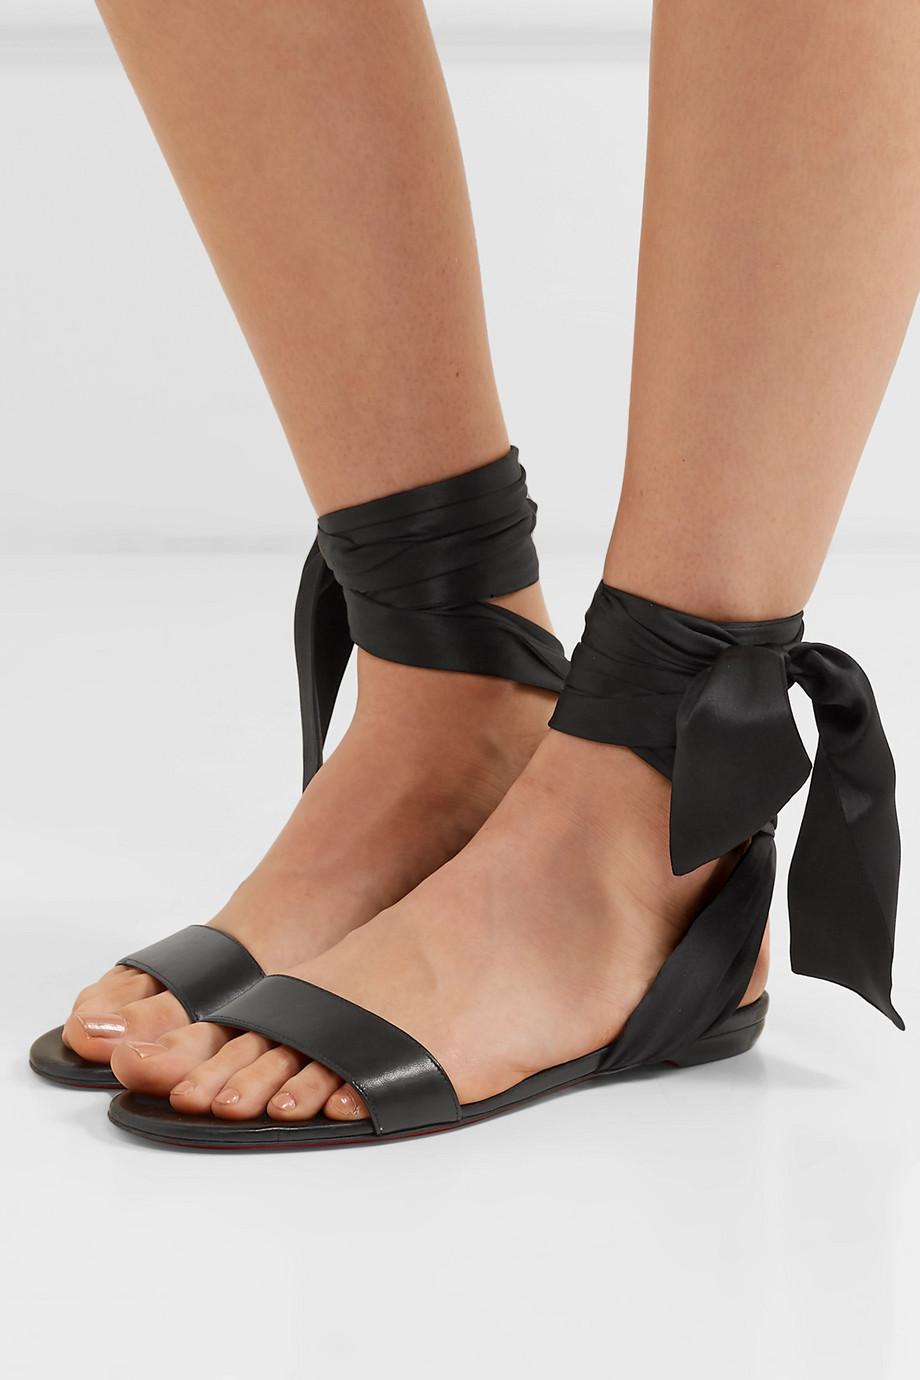 Christian Louboutin Sandale Du Desert leather and satin sandals